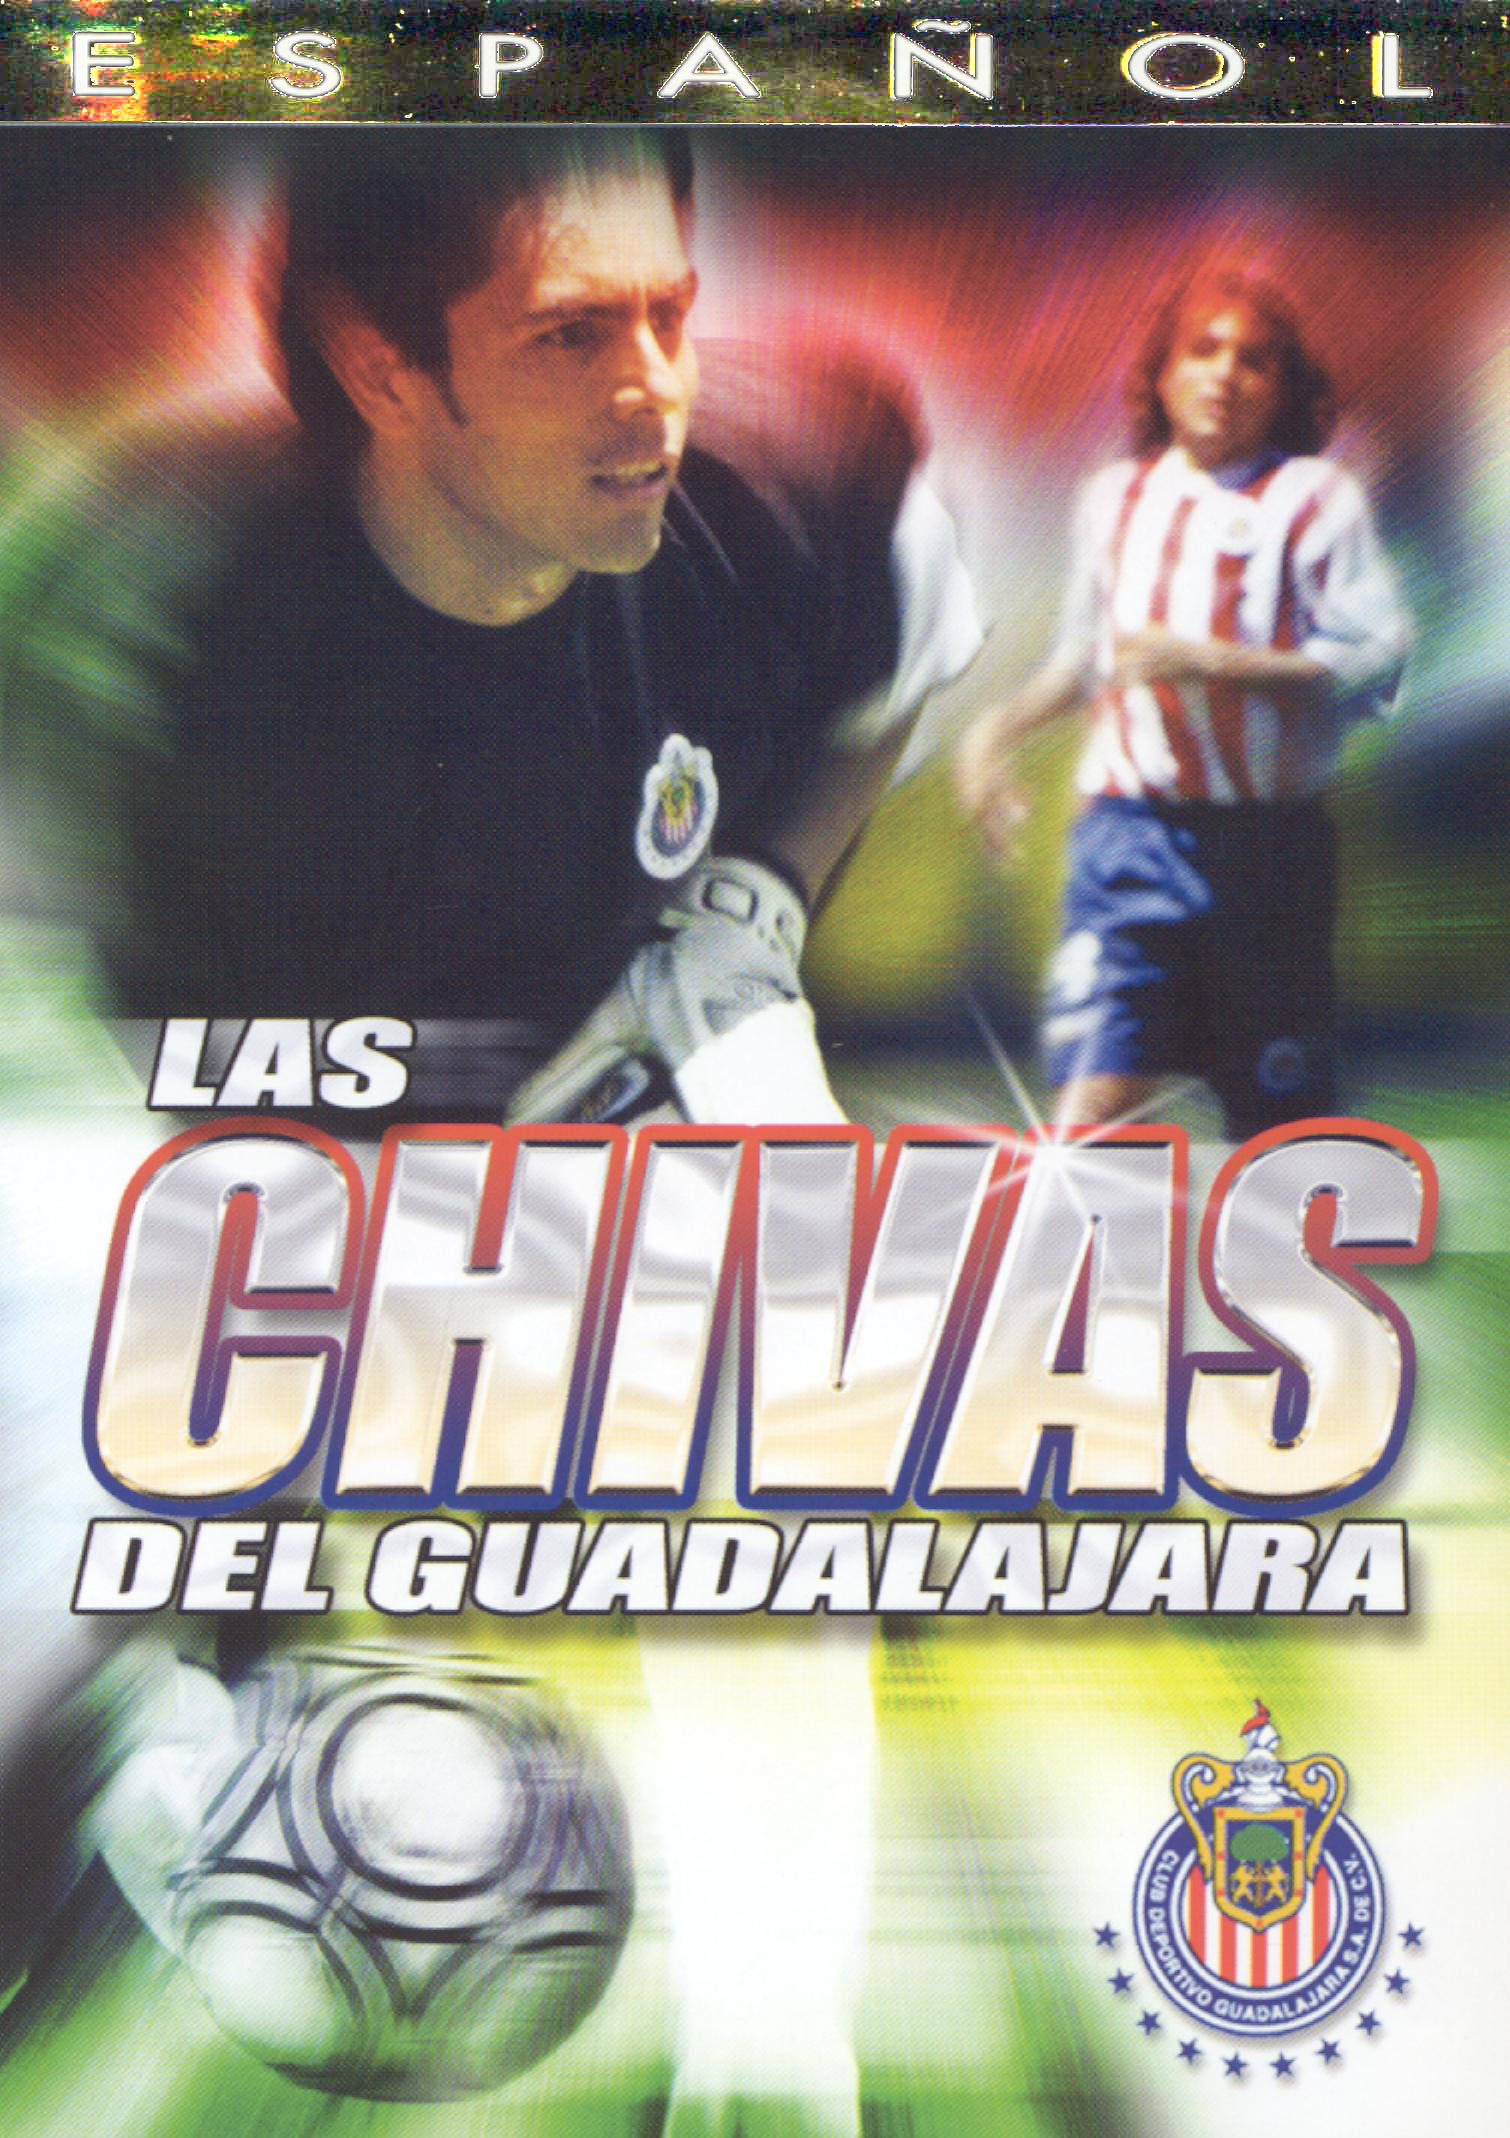 Las Chivas del Guadalajara